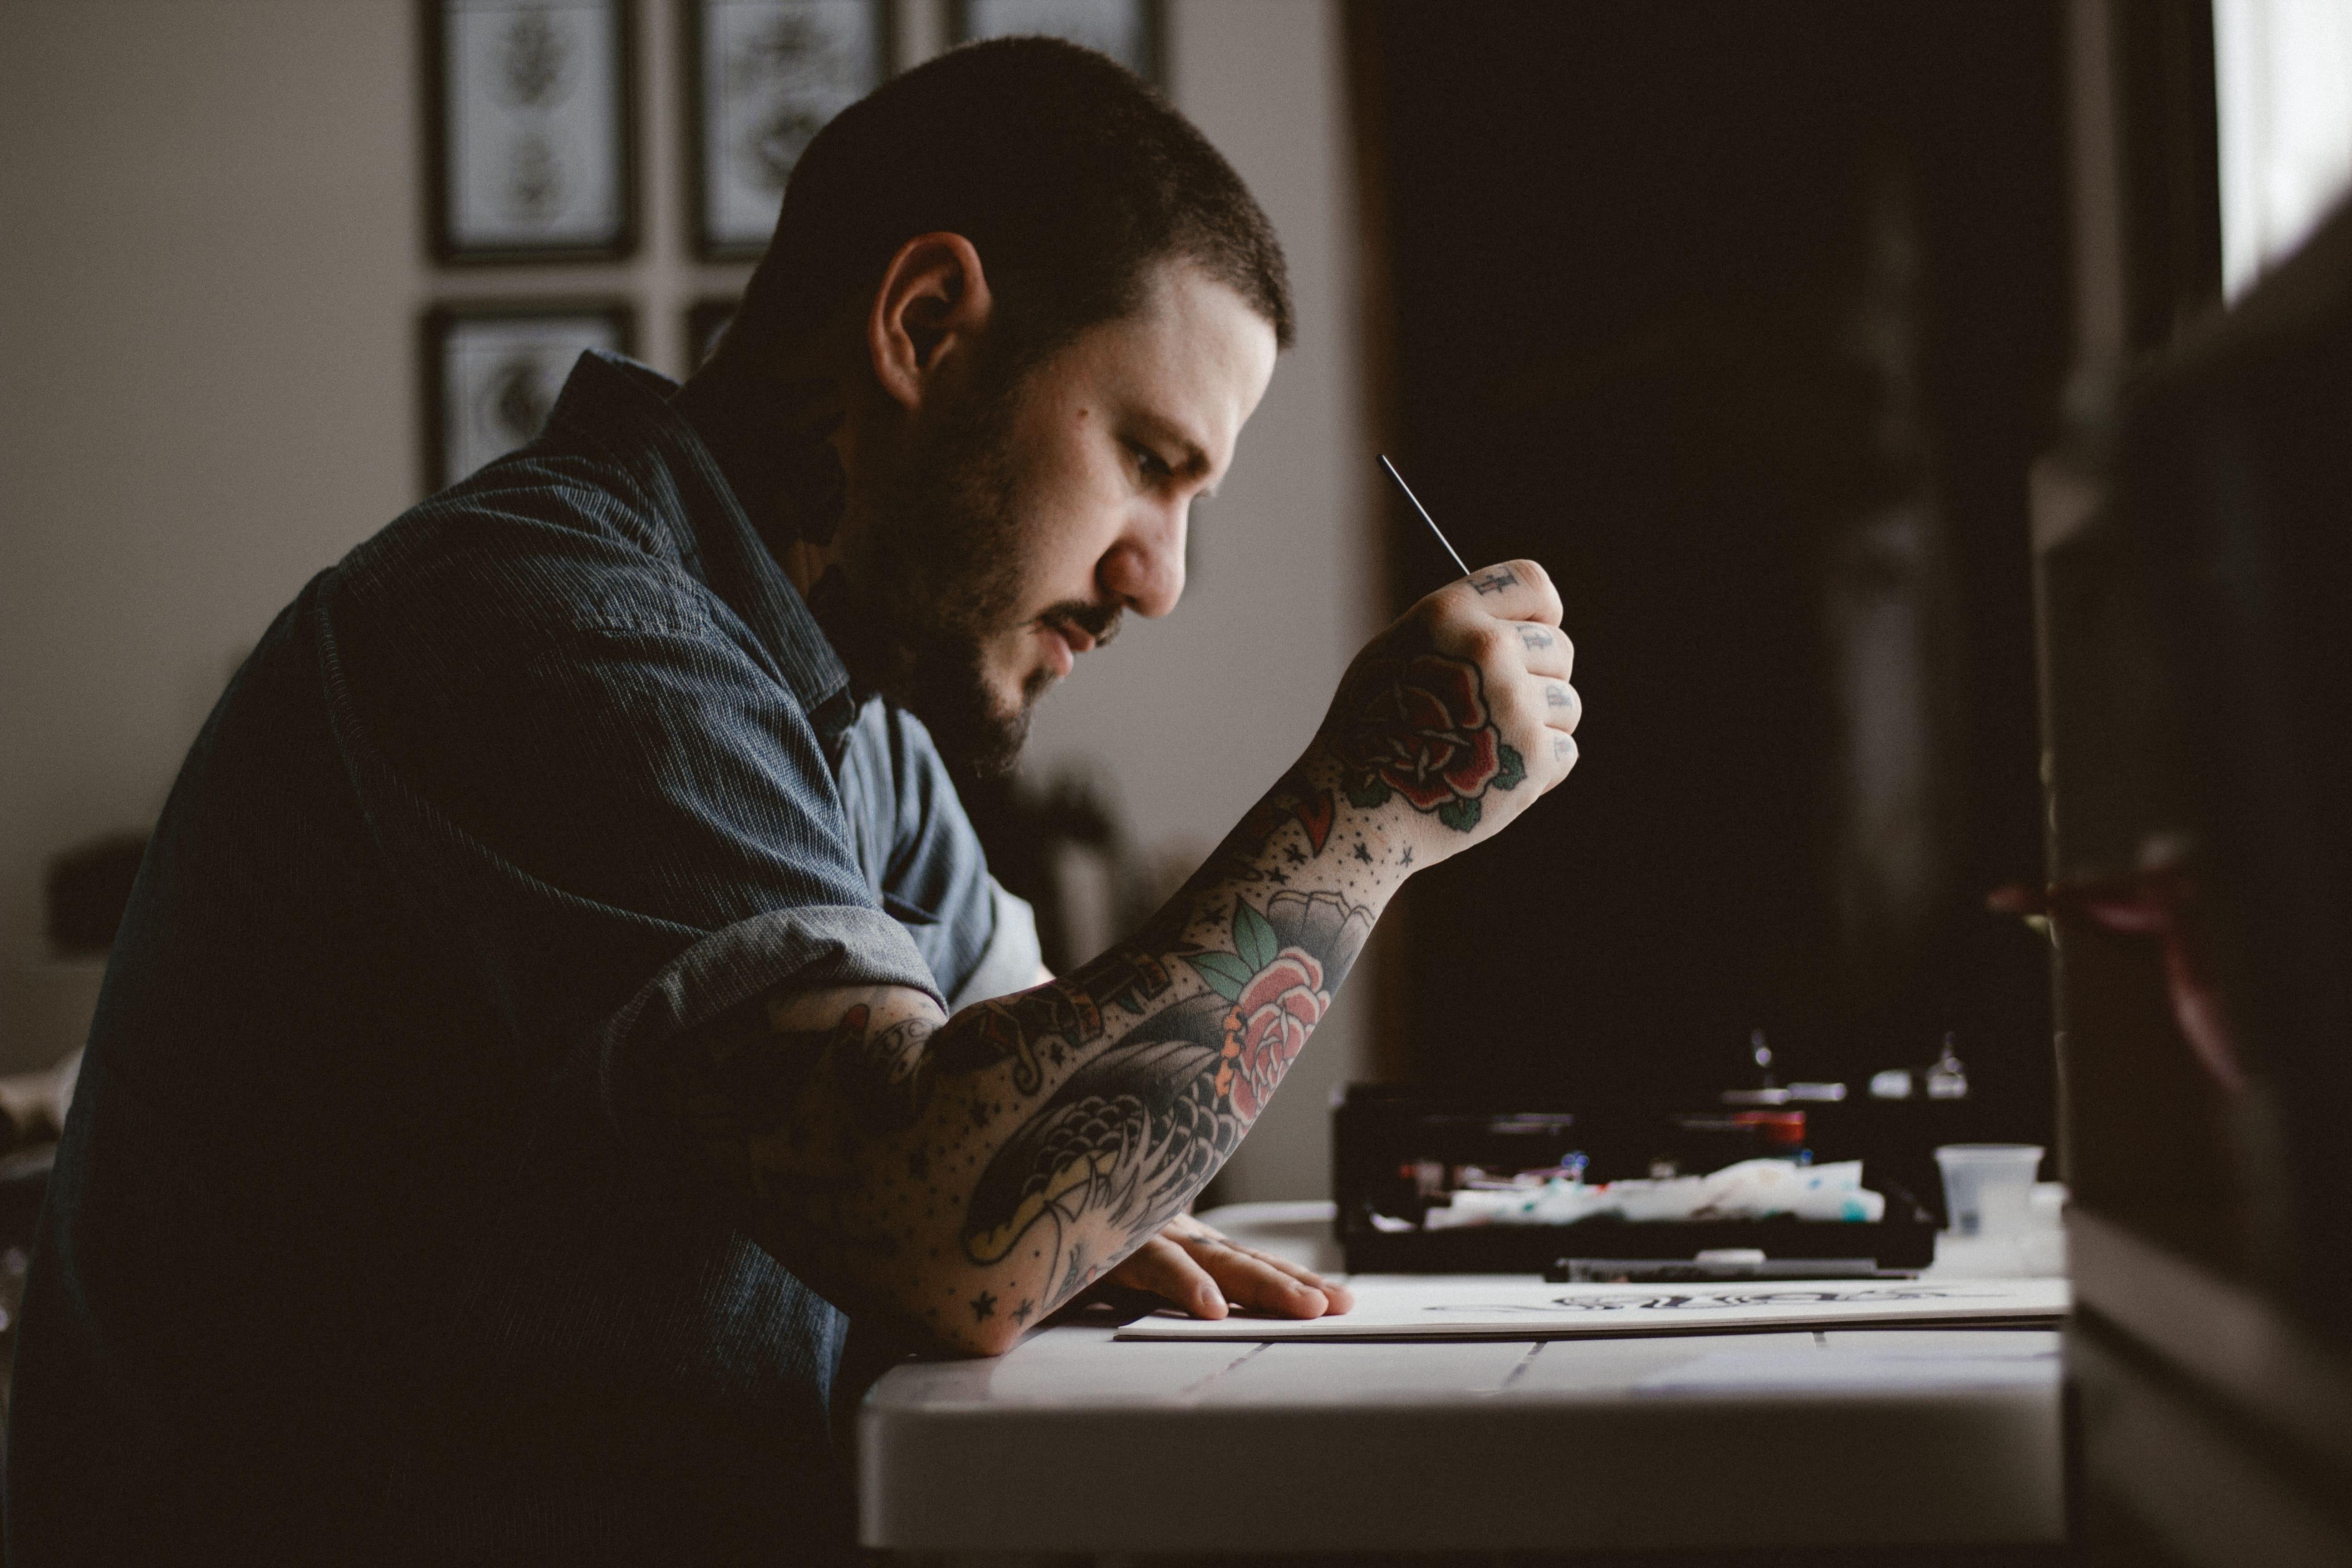 Man's creative process